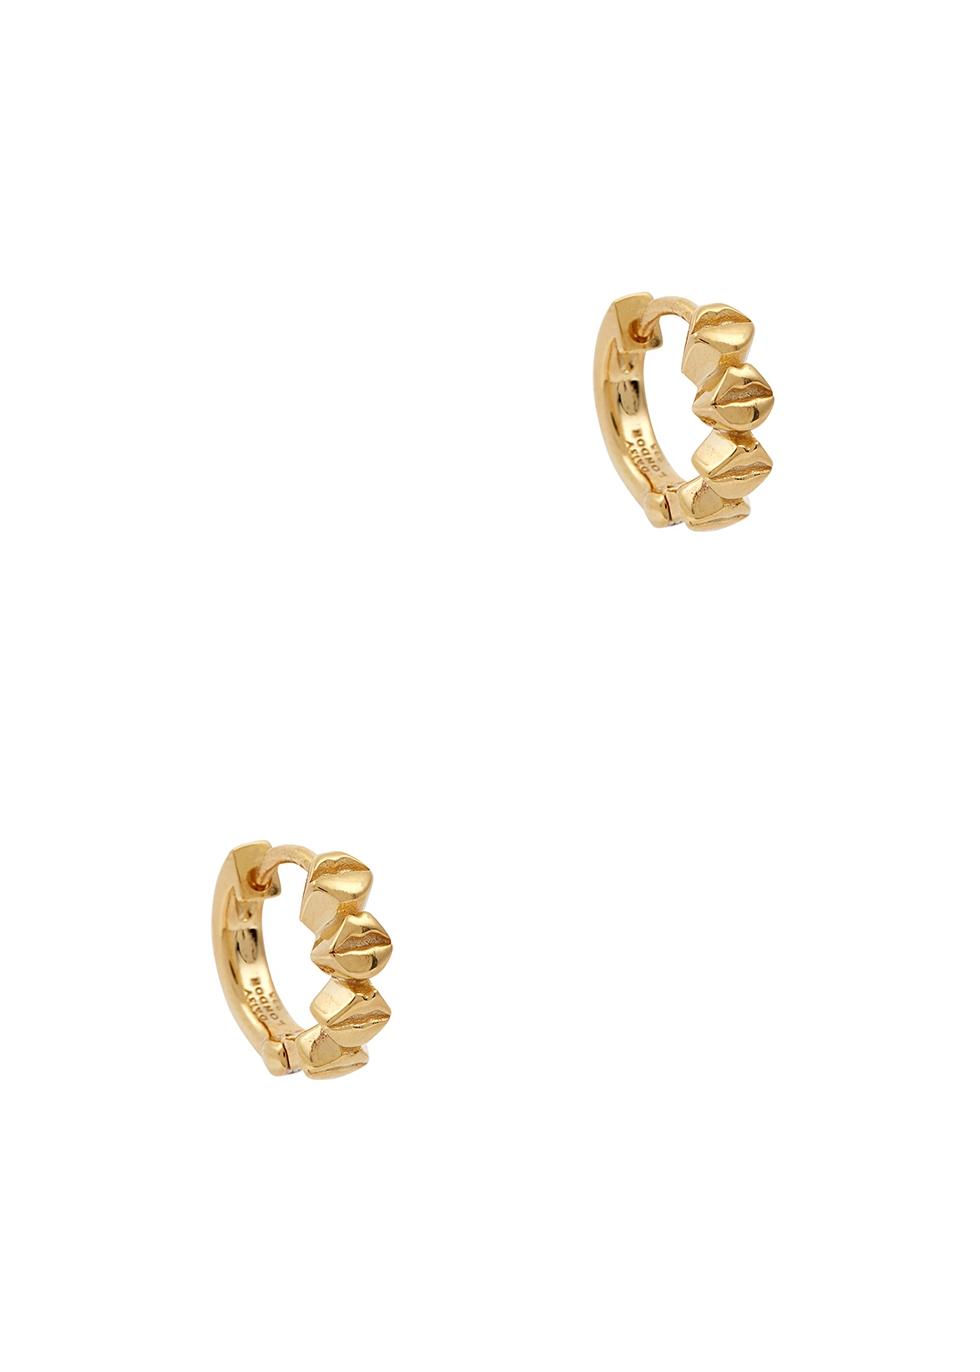 Vita Lips 18kt gold-plated hoop earrings